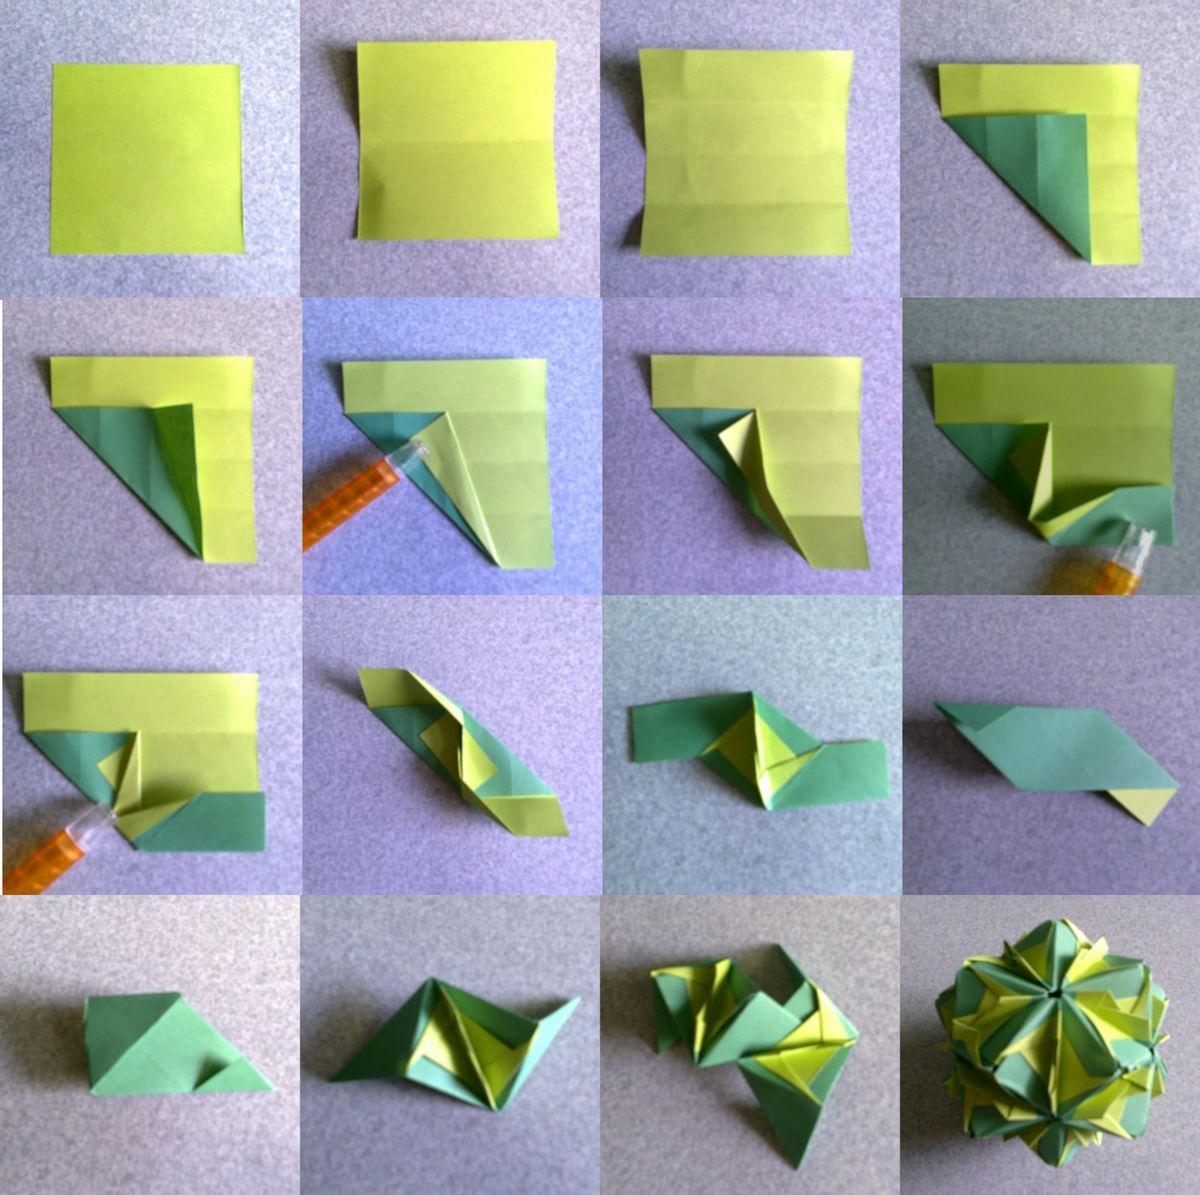 Pin By Jonathan Villalobos On Origami Pinterest Modular Flowers Instructions Diagrams Cube Art Tutorial